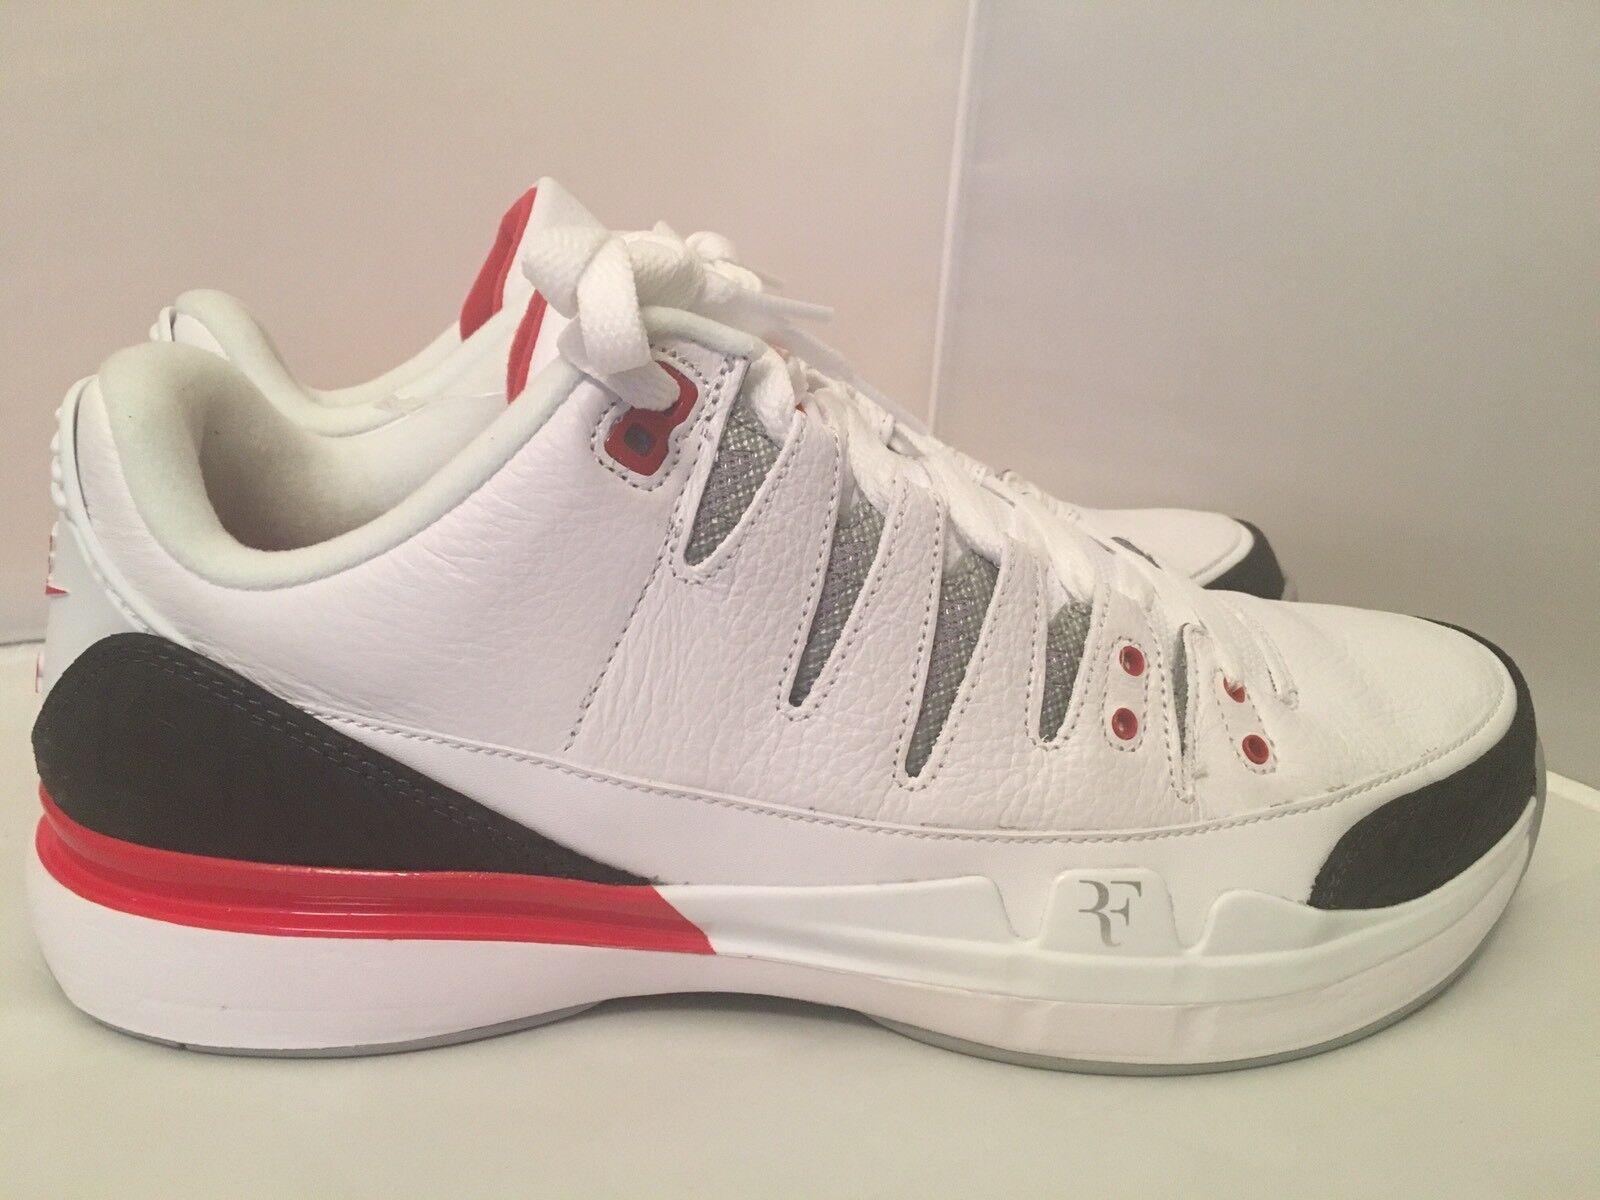 3481b739671a4f ... Nike Nike Nike Zoom Vapor x AJ3 Roger Federer RF Fire Red 709998 106  c44593 ...